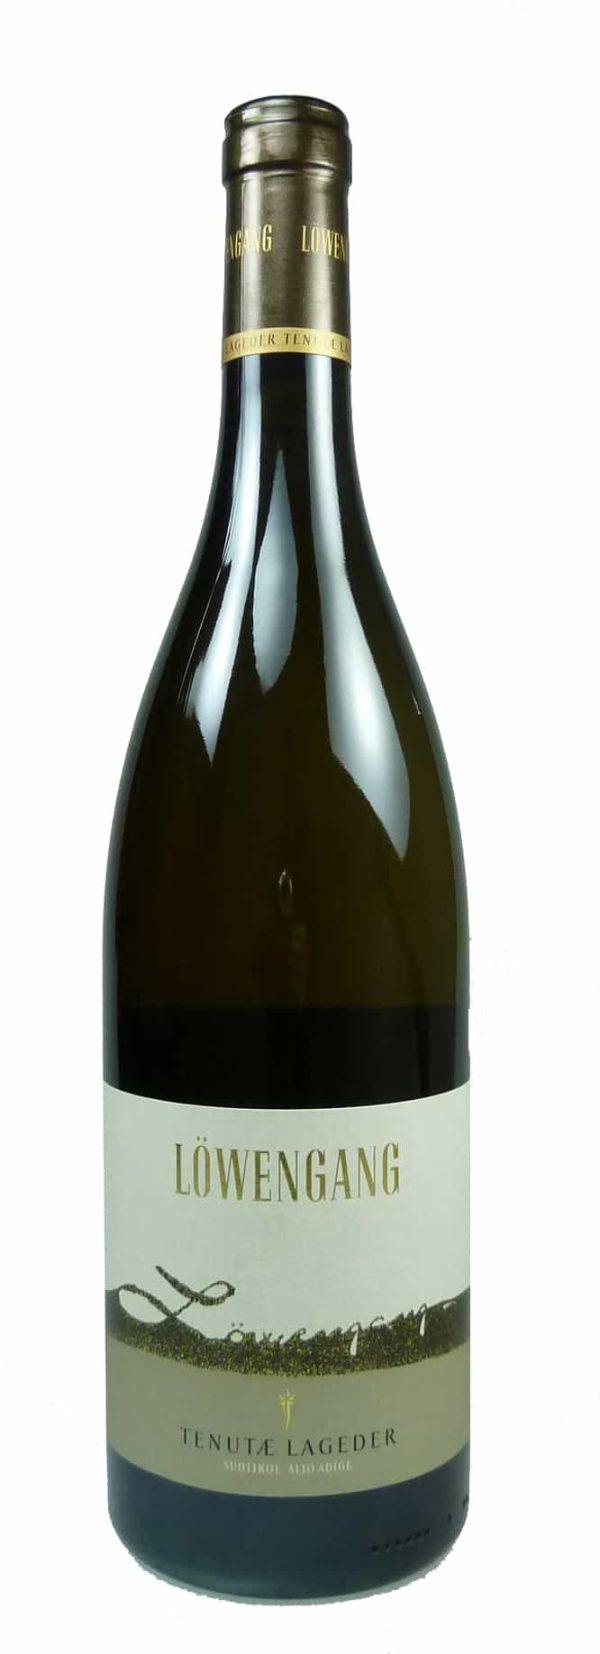 Löwengang Chardonnay Tenutae Lageder 2015